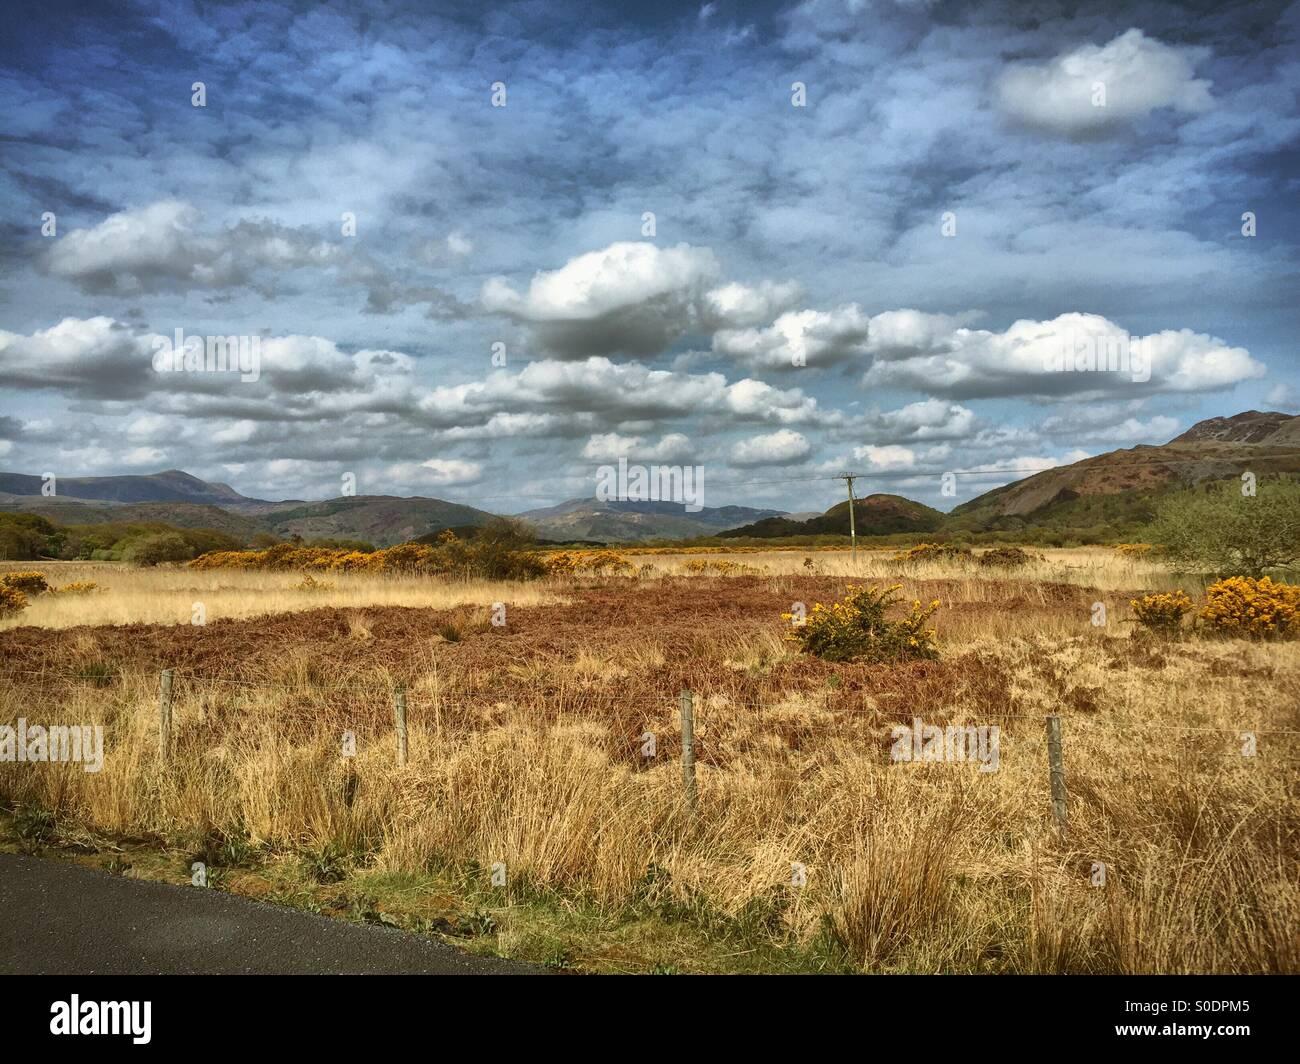 North Wales - Stock Image